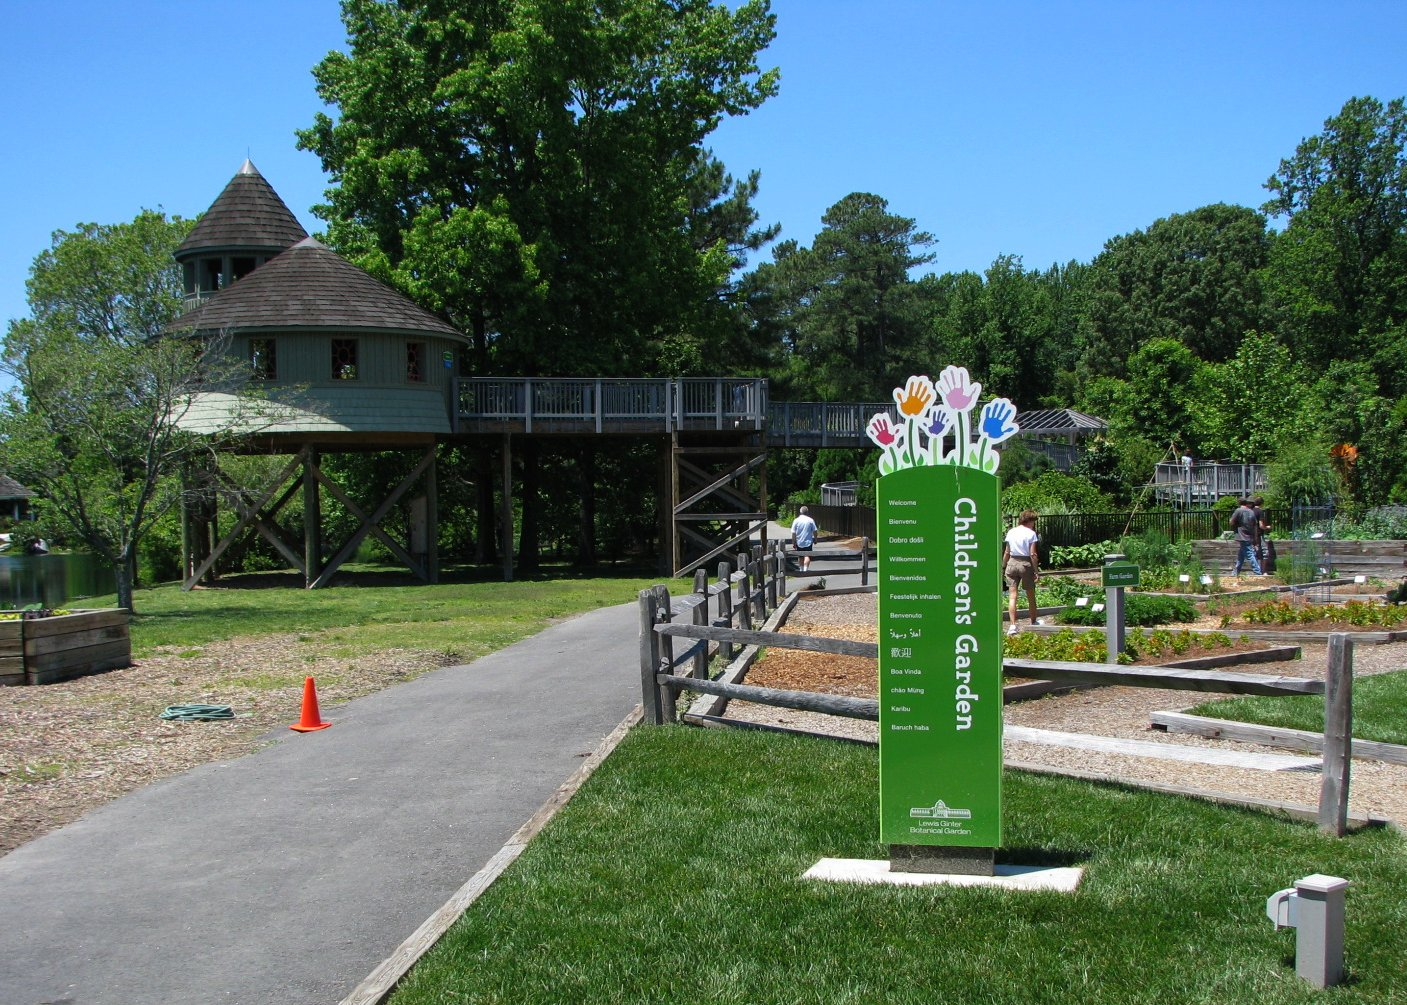 lewis ginter botanical garden wikiwand - Lewis Ginter Botanical Garden